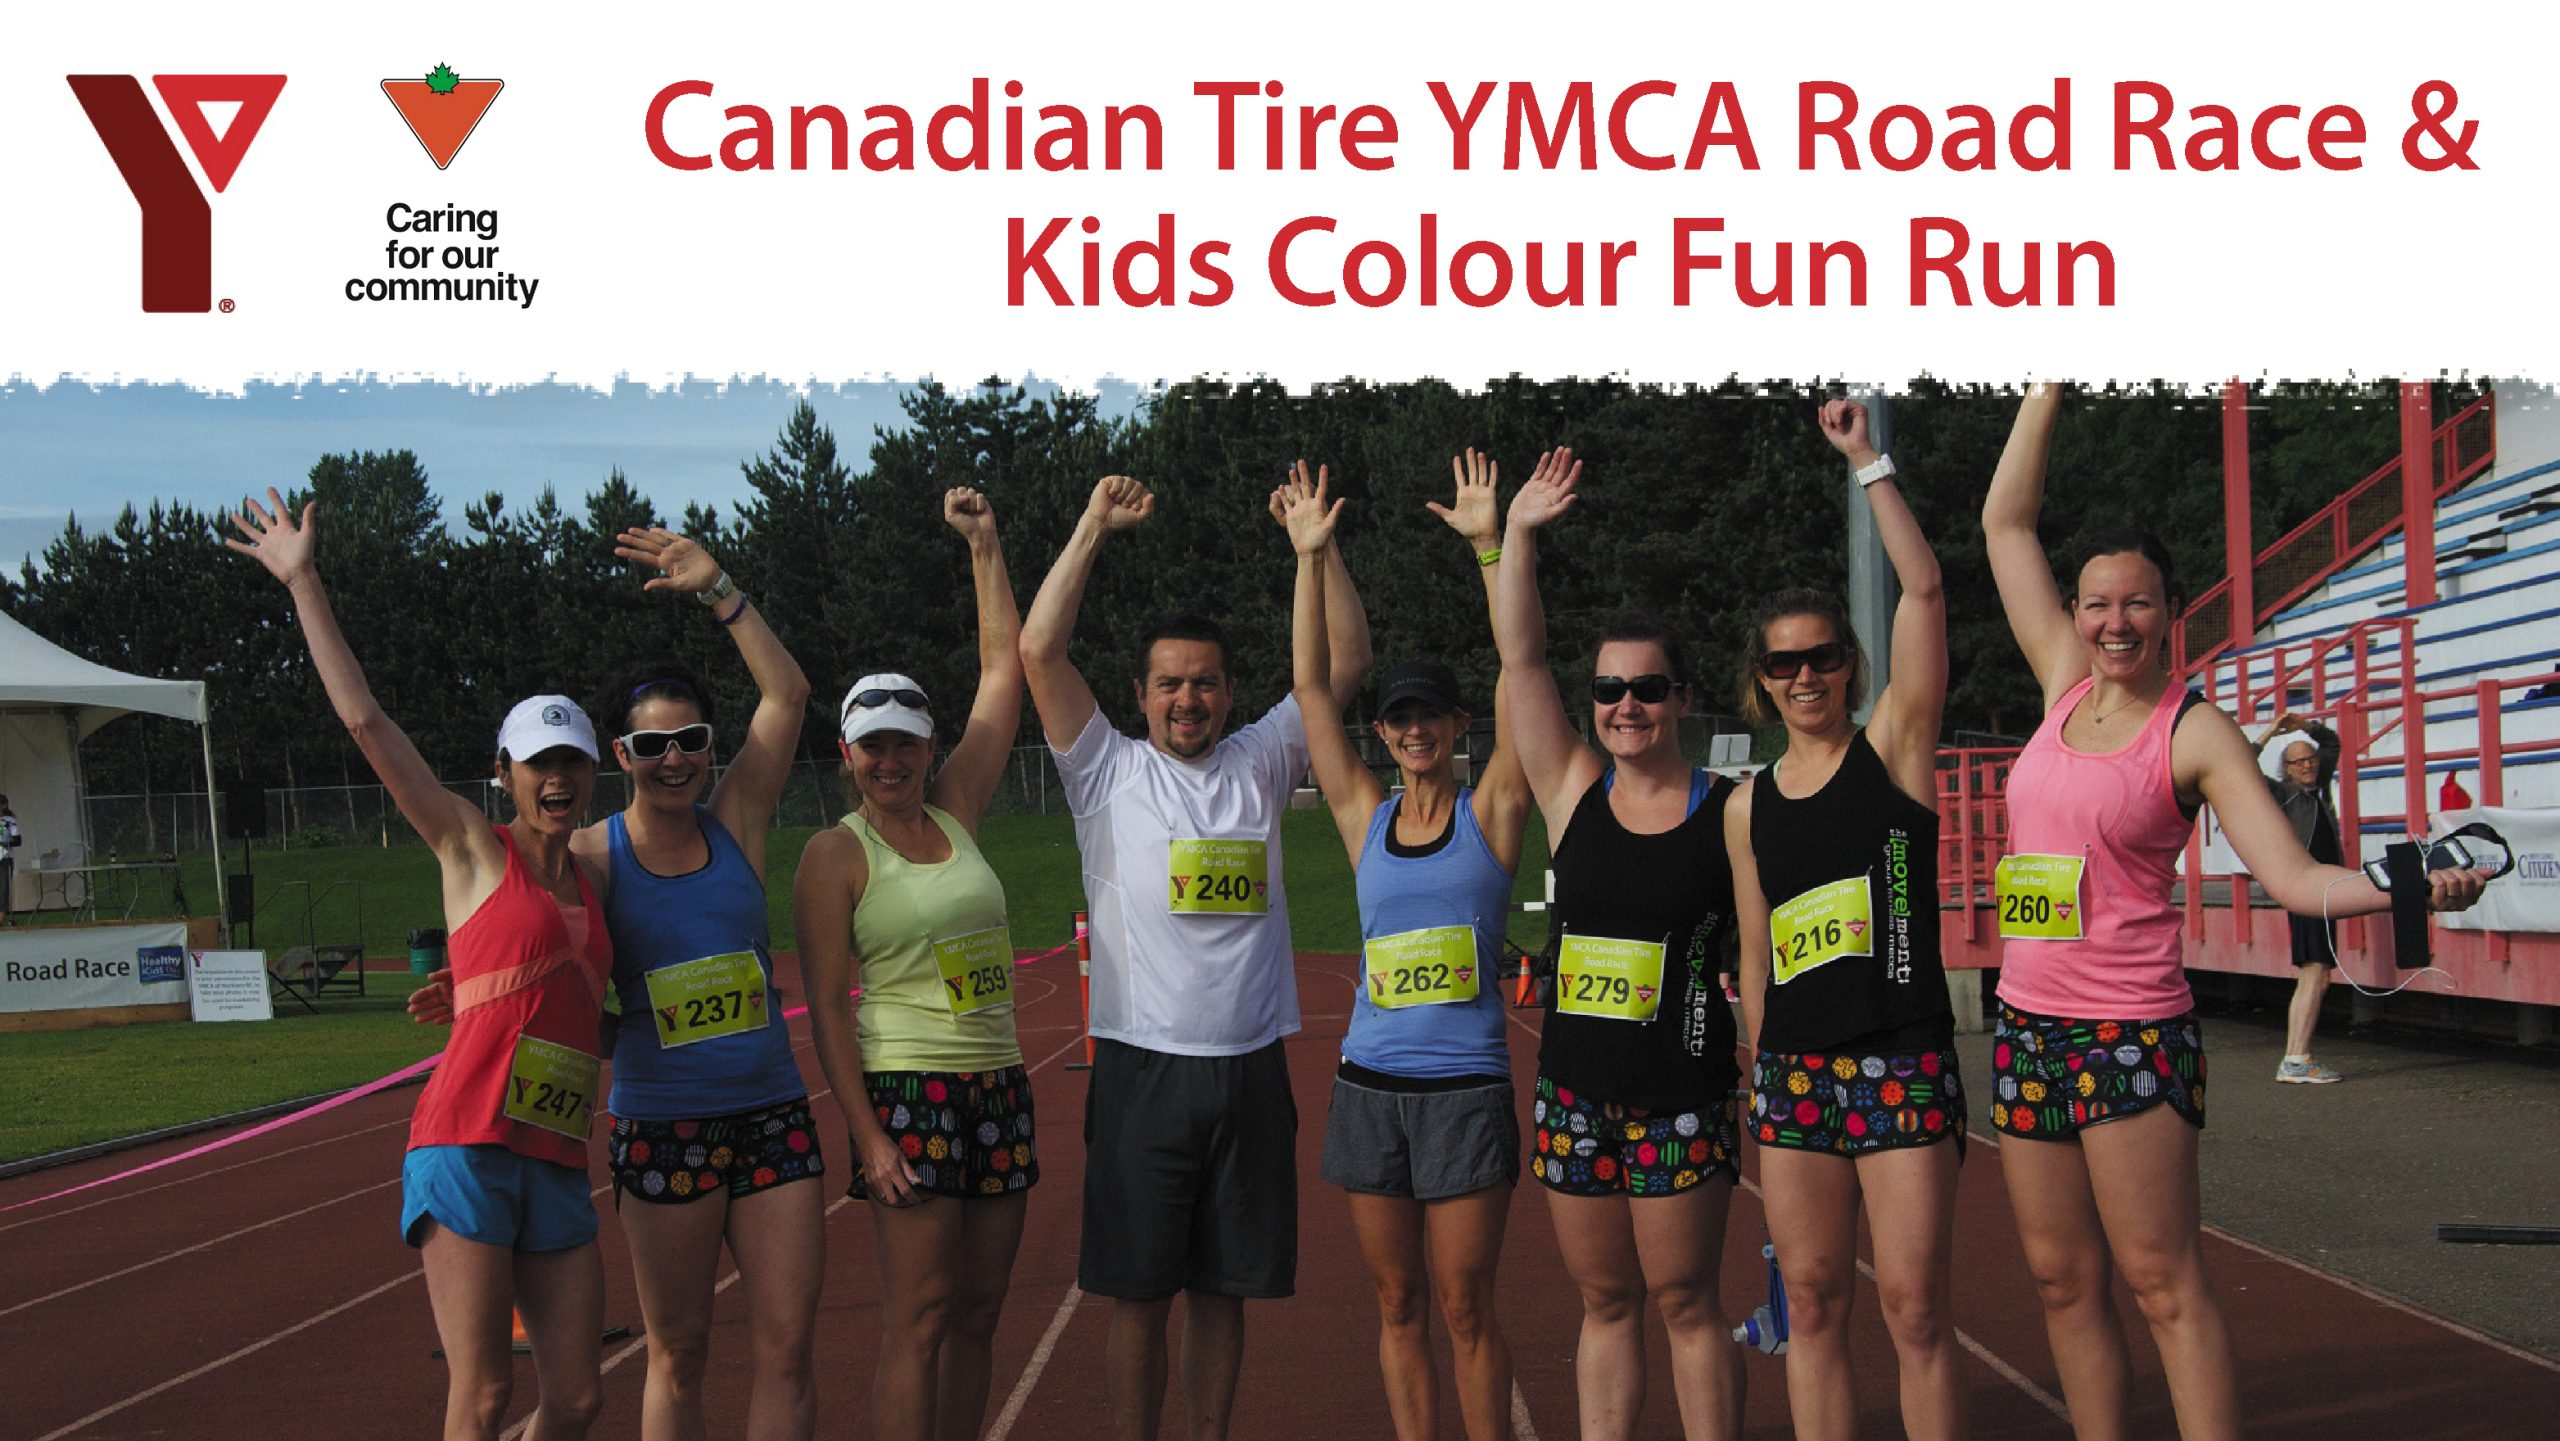 Canadian Tire YMCA Road Race & Kids Colour Fun Run